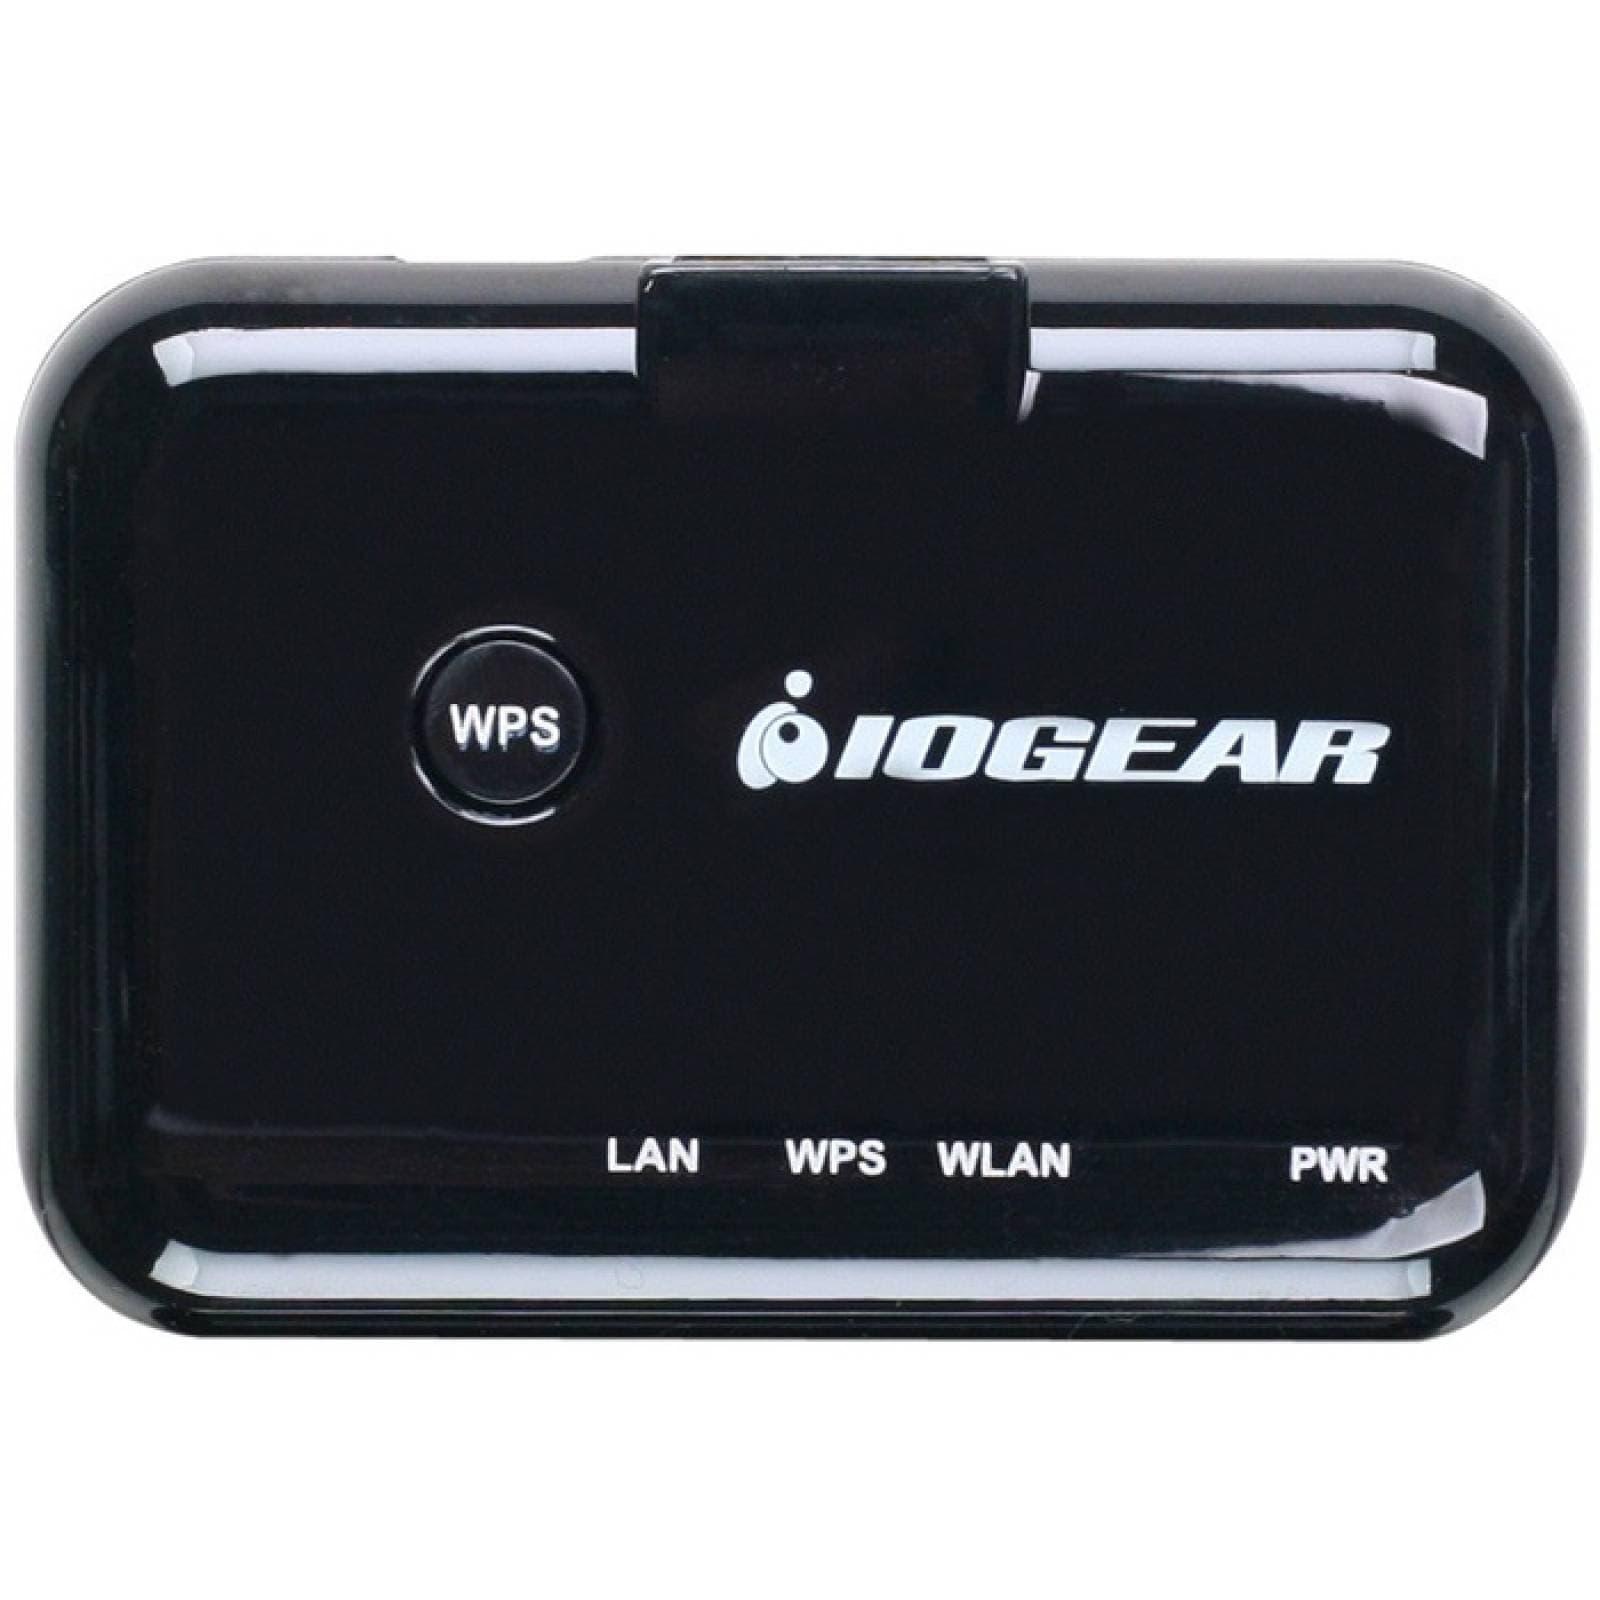 IOGEAR IEEE 80211n  Adaptador de WiFi para computadora de escritorio  TV  DVR  Consola de juegos  Reproductor de